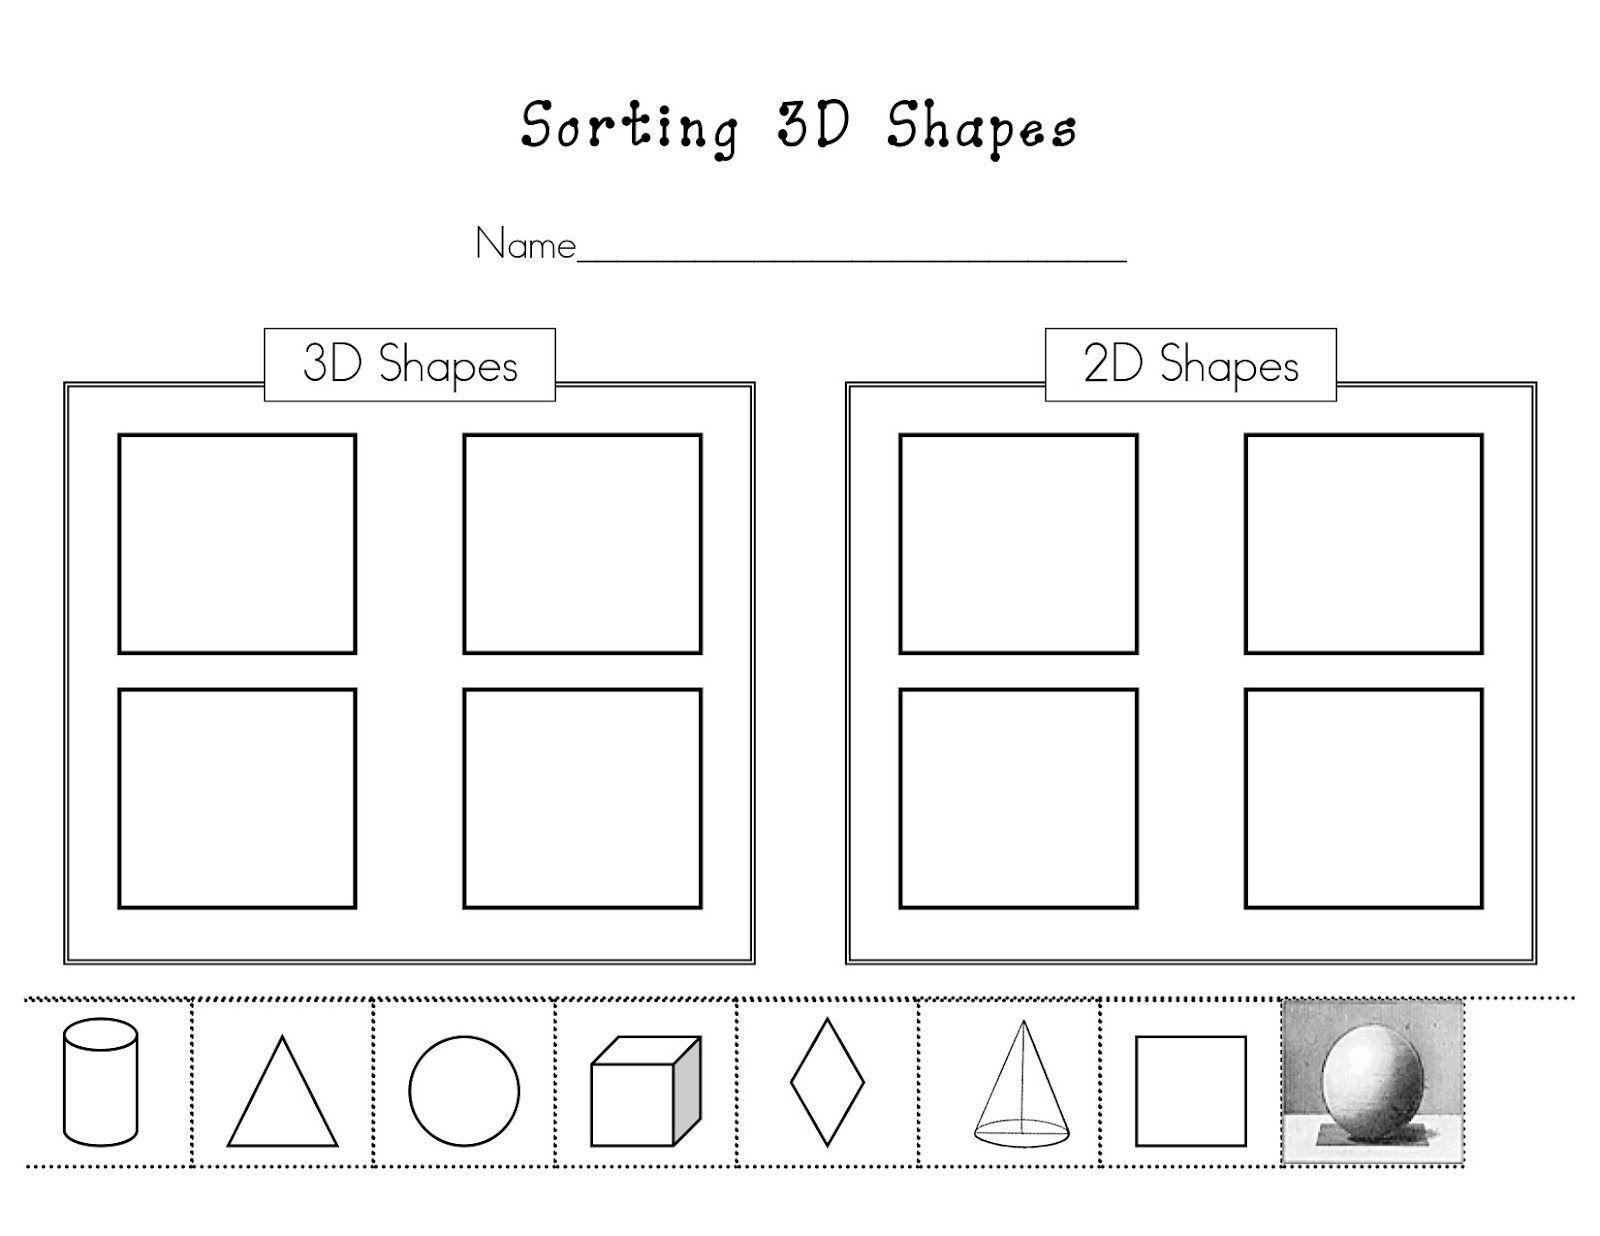 3d Shape Worksheet For Kindergarten Teaching 3d Shapes